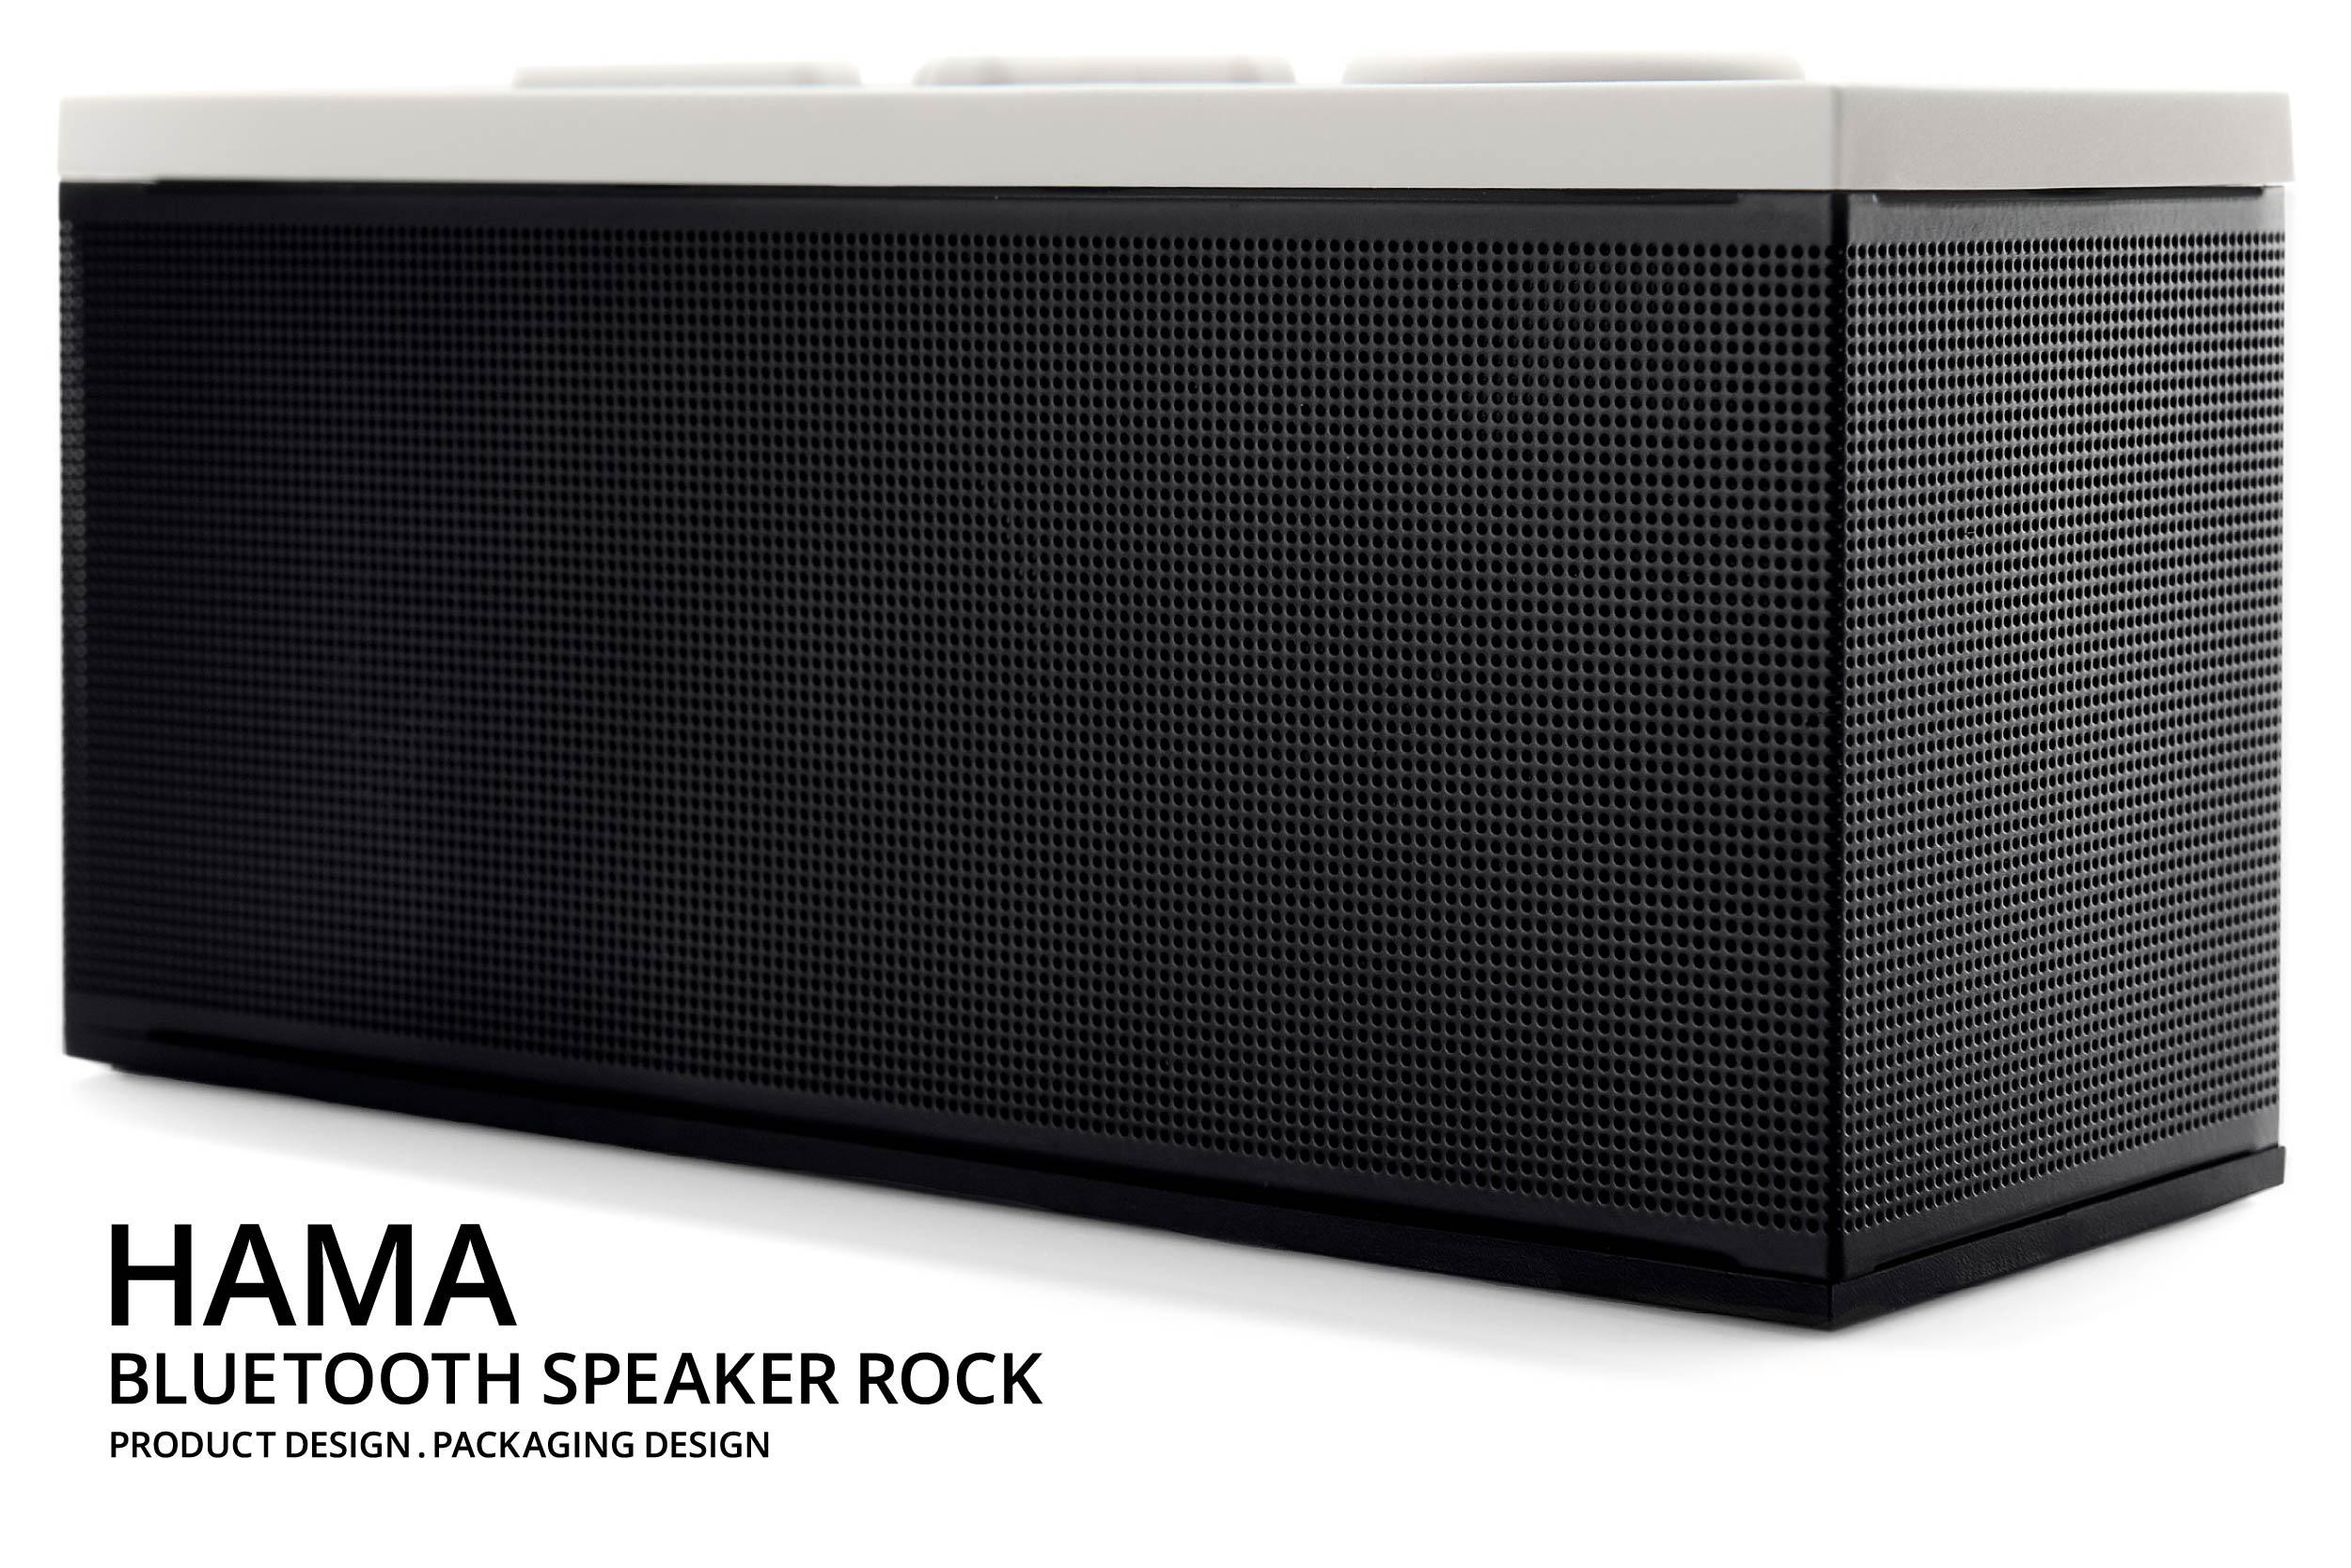 HAMA-SPEAKER-1